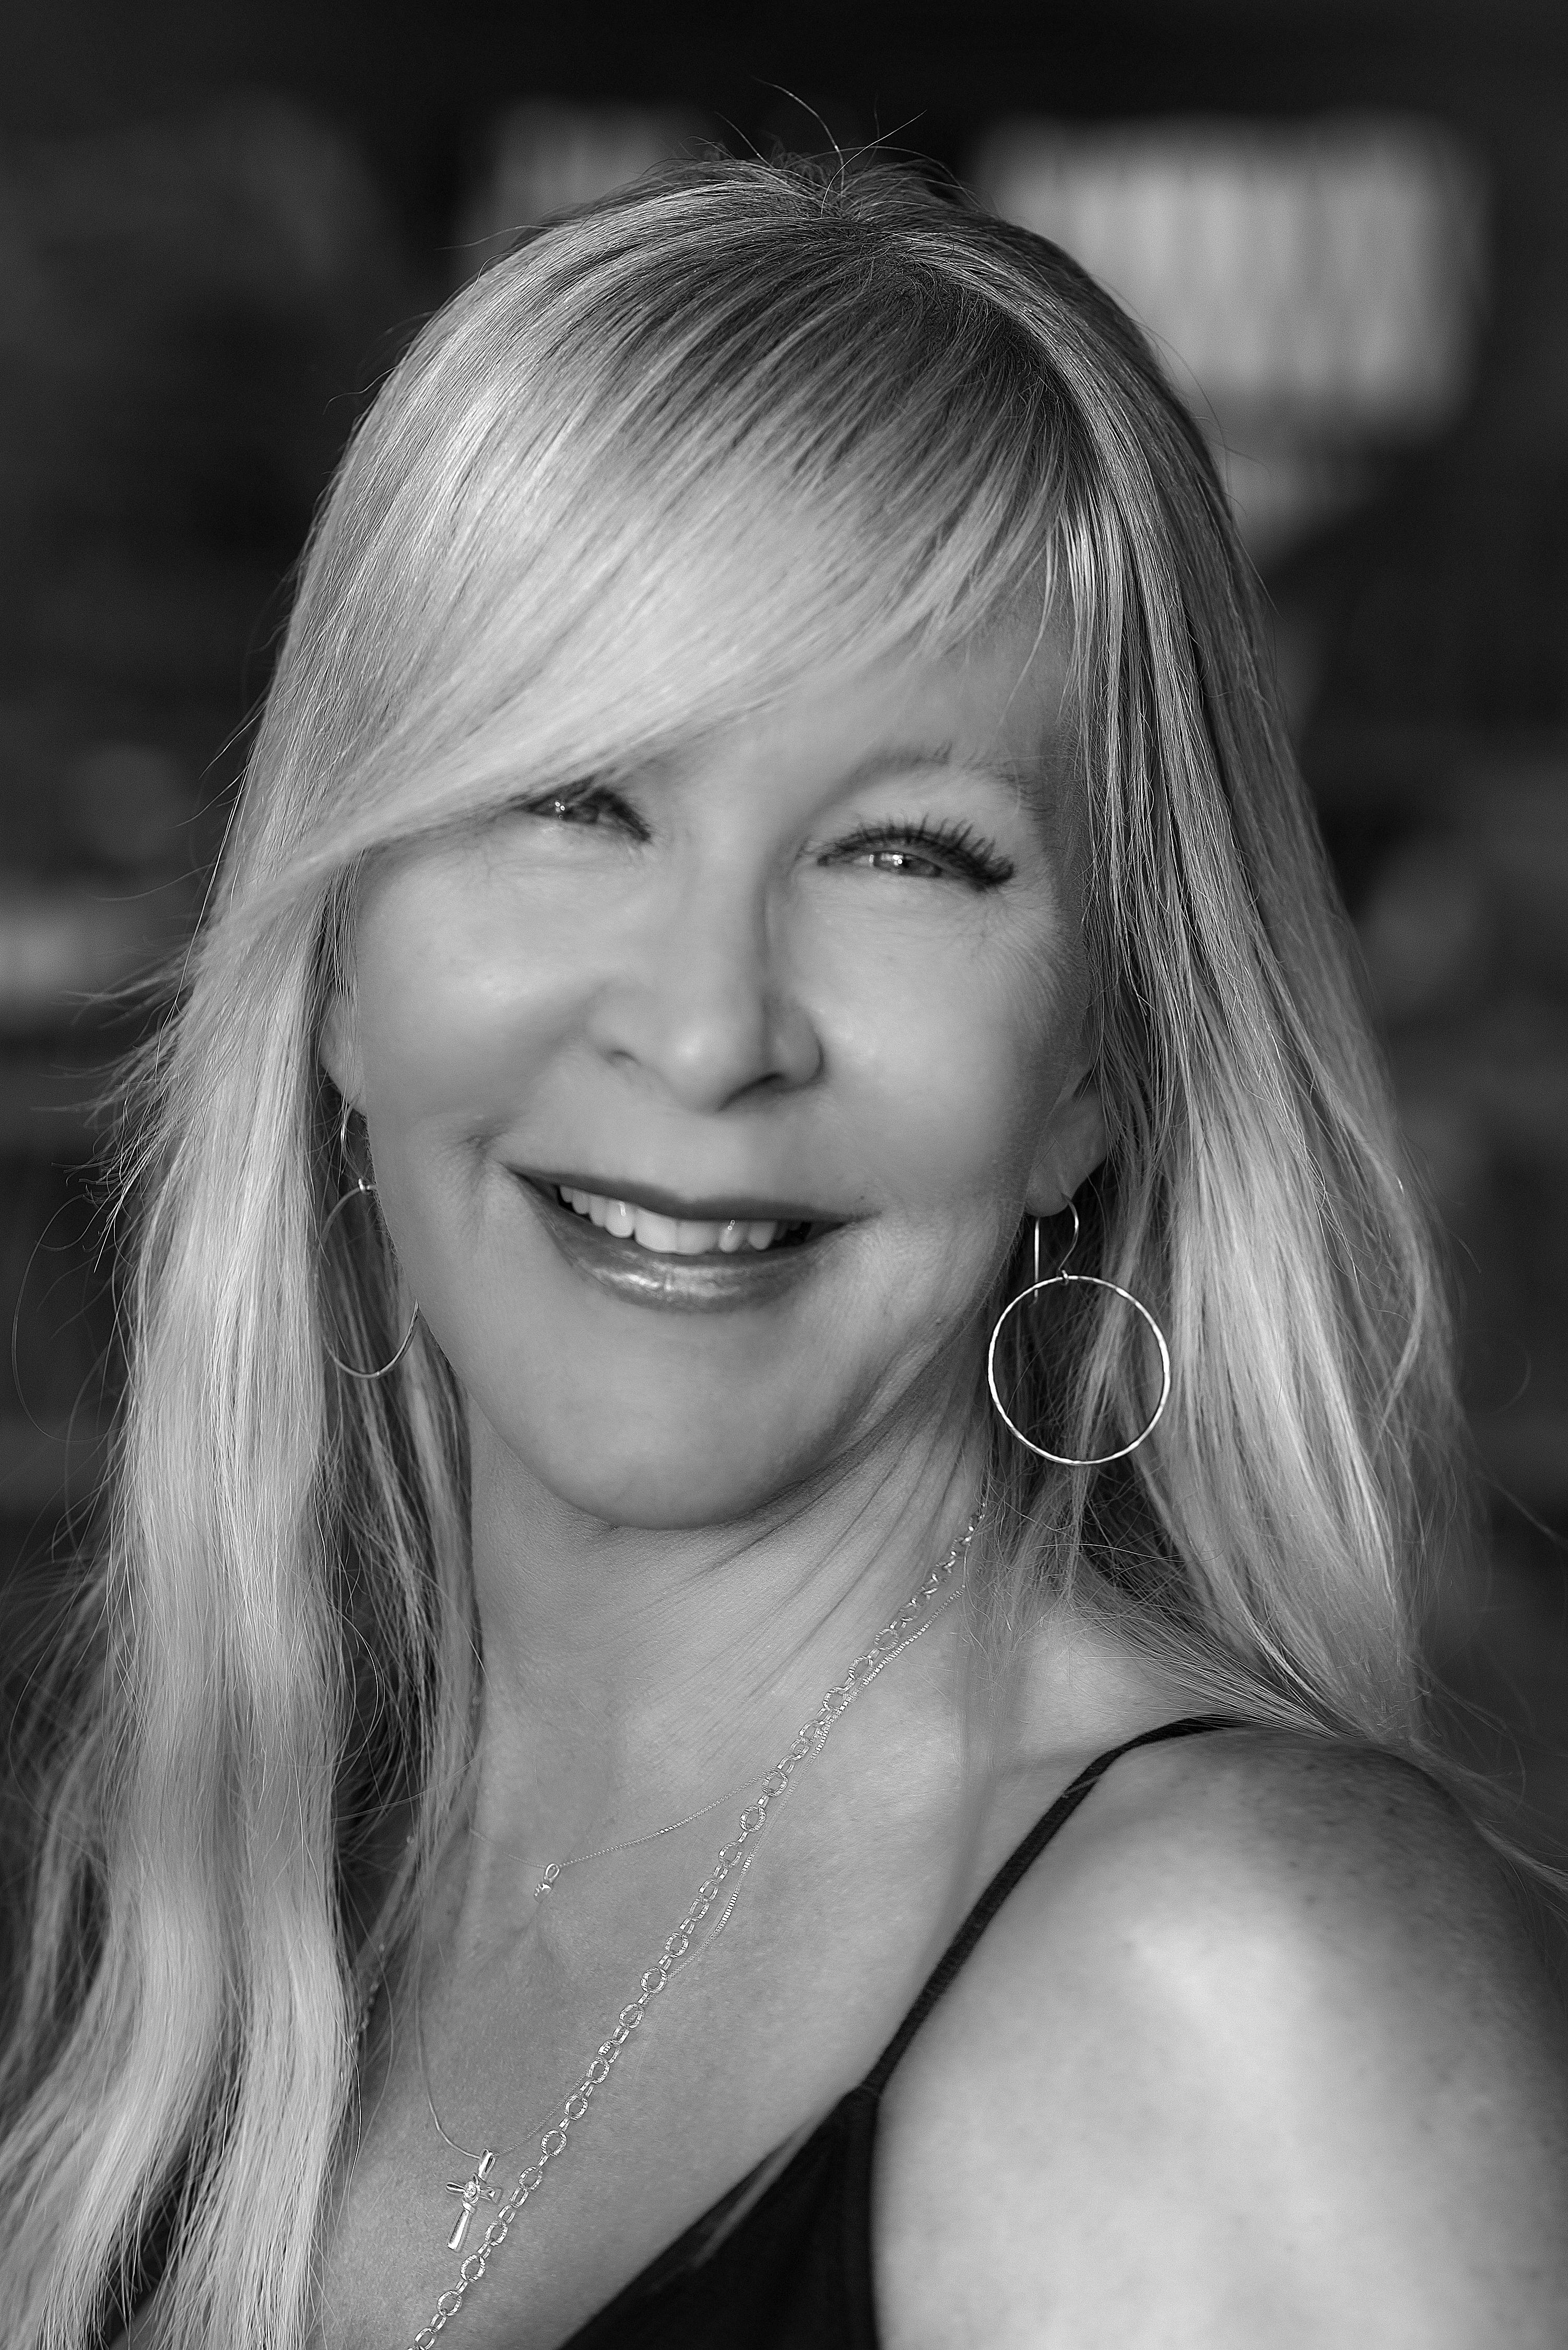 Kathy J. Christiansen